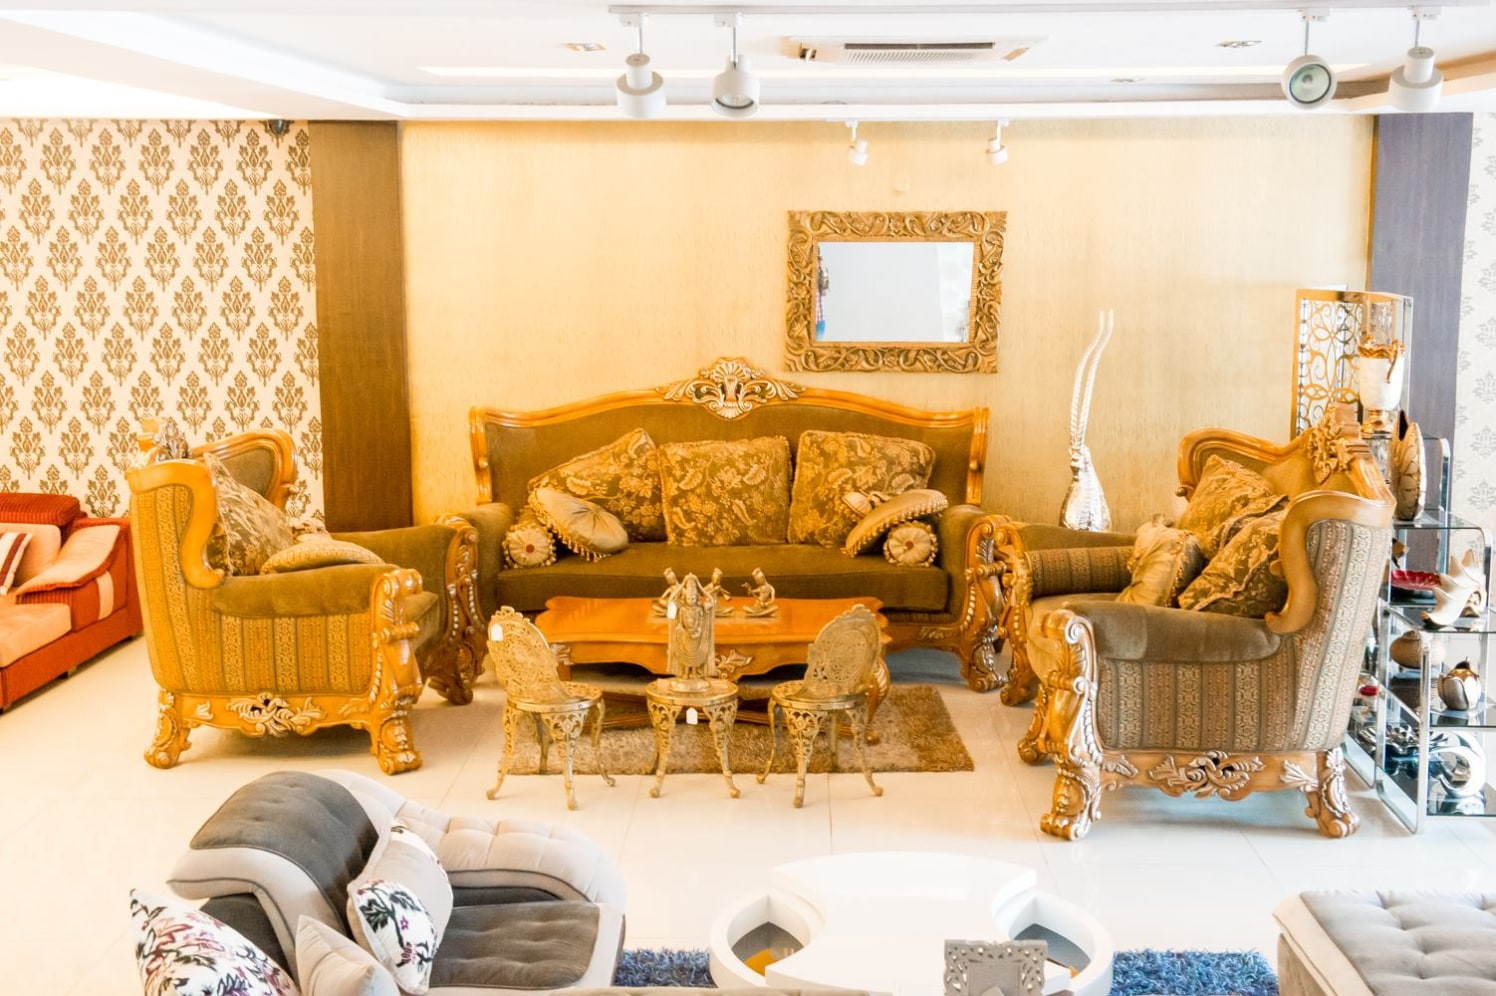 Sofa Showcase With Traditional Sofas by Ishika singh | Interior Design Photos & Ideas